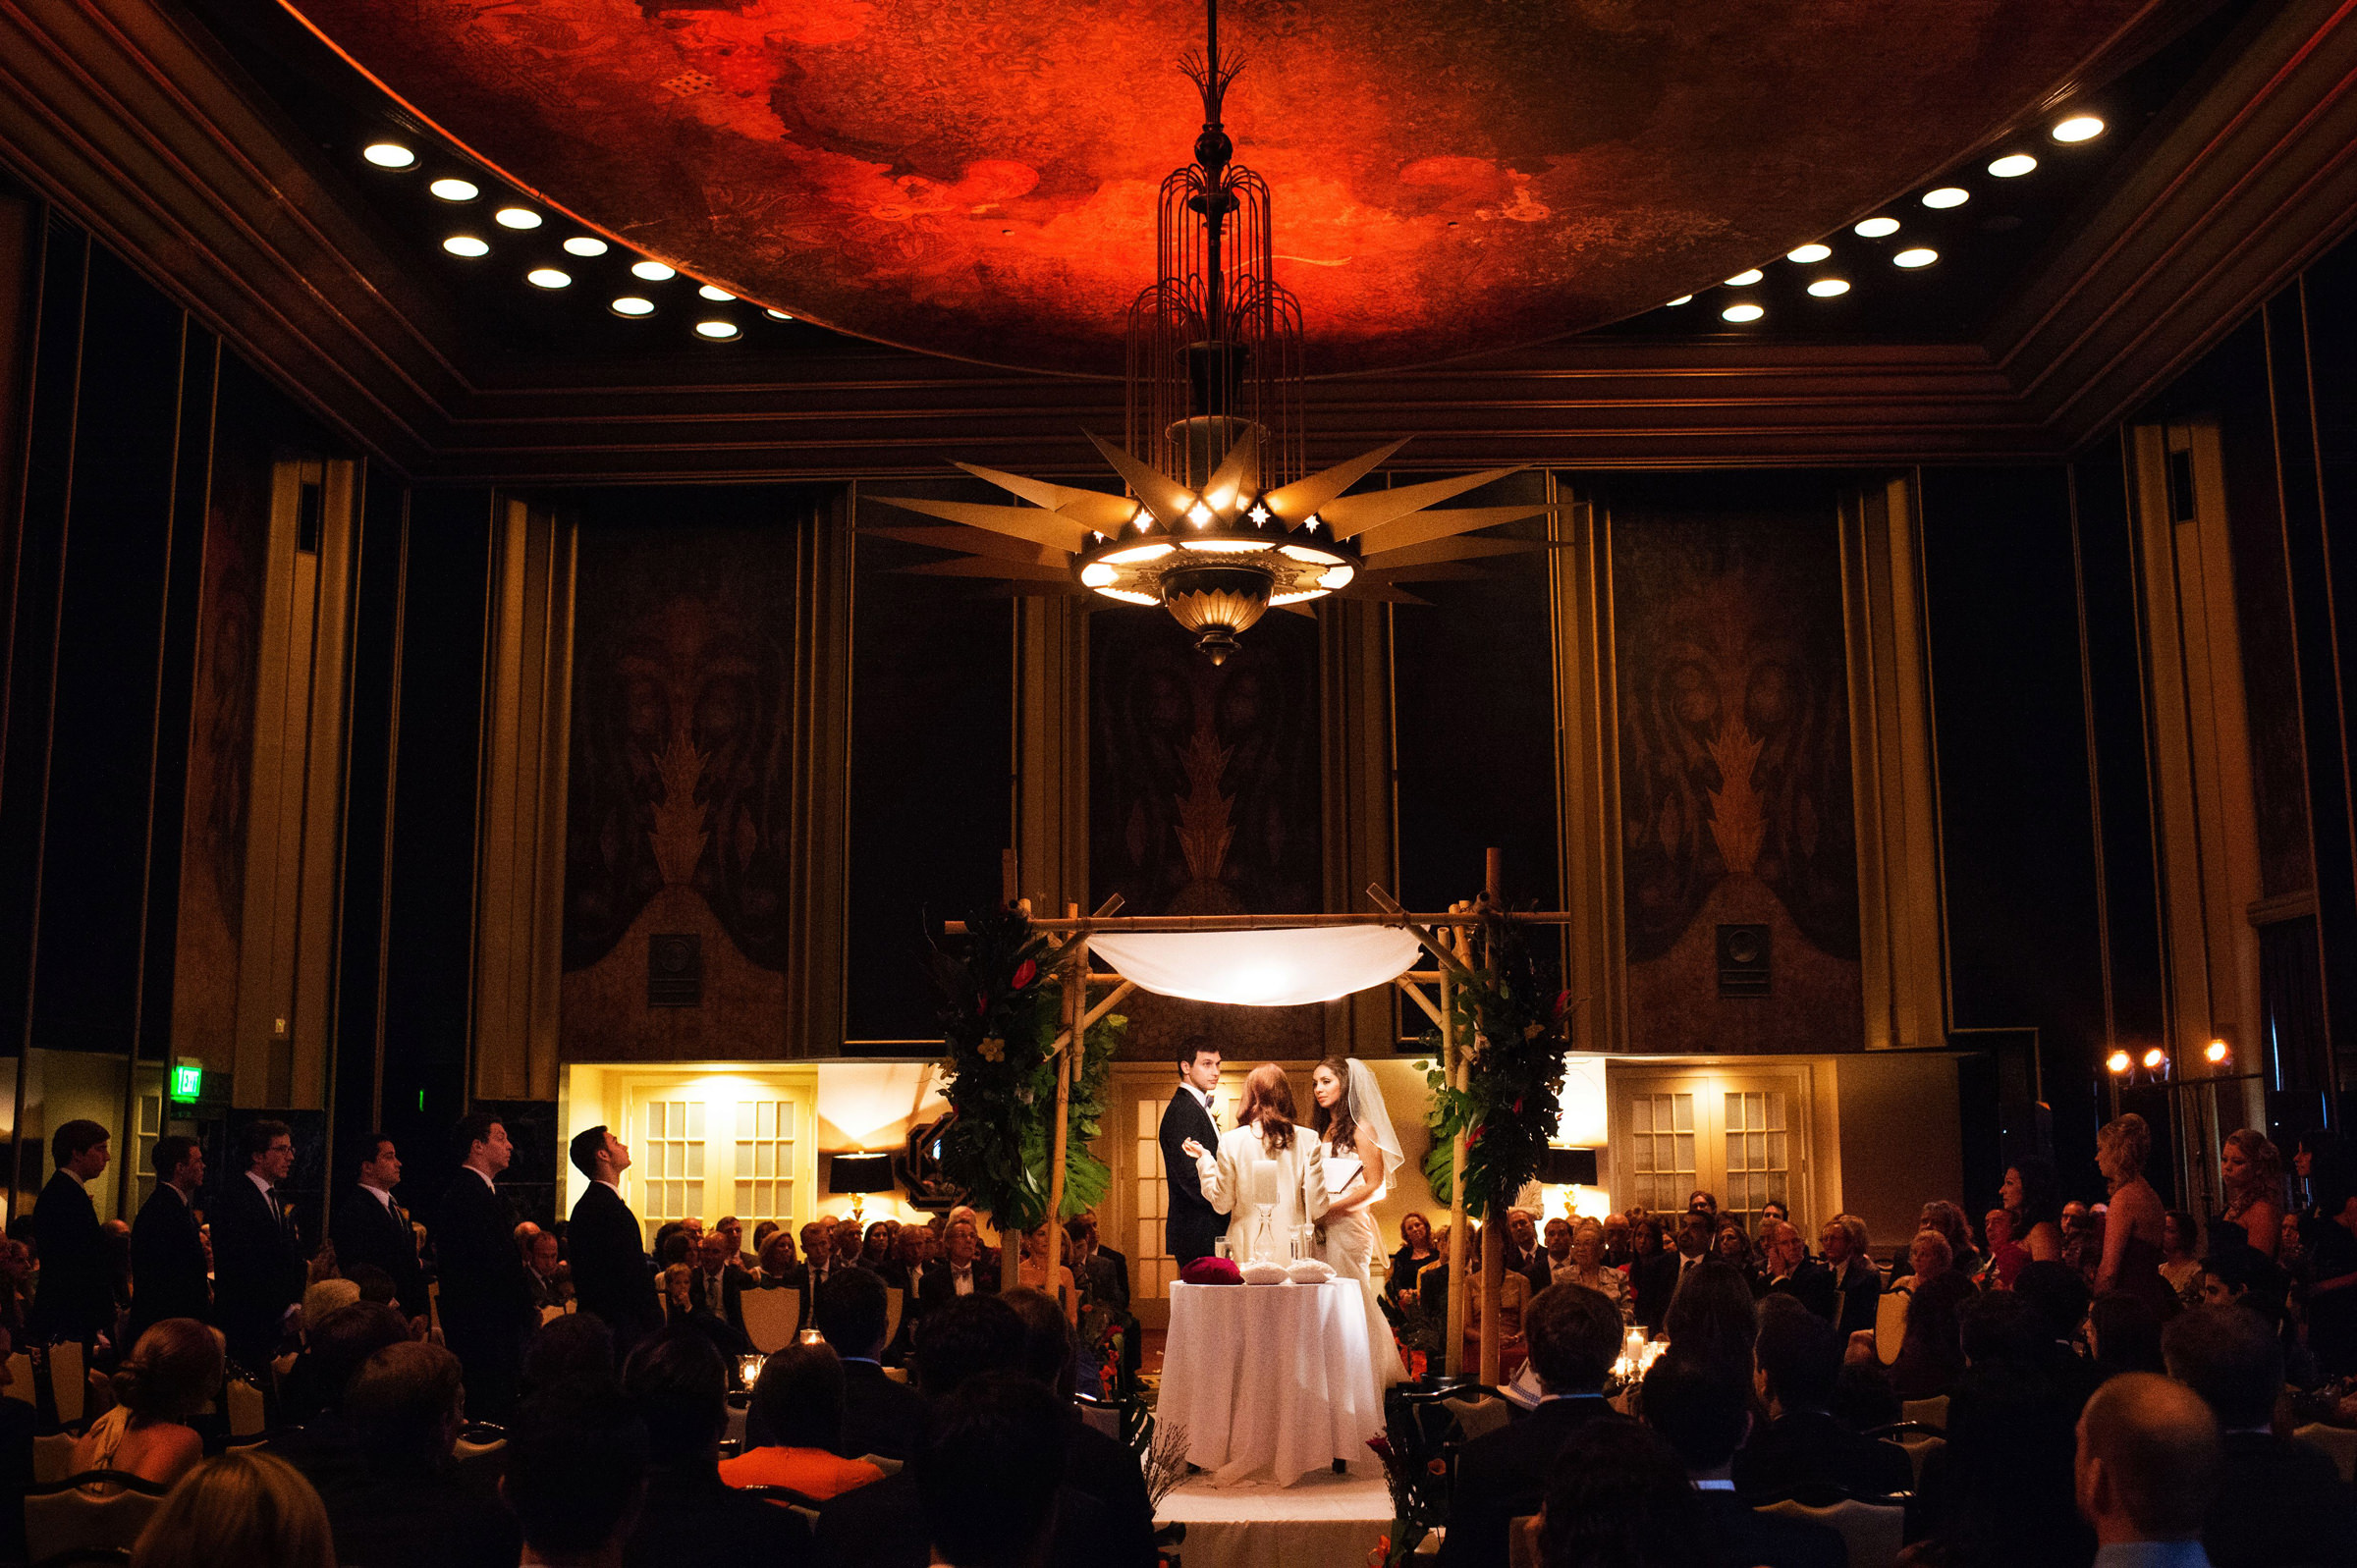 spotlight-on-ceremony-under-huppah-joe-appel-photography